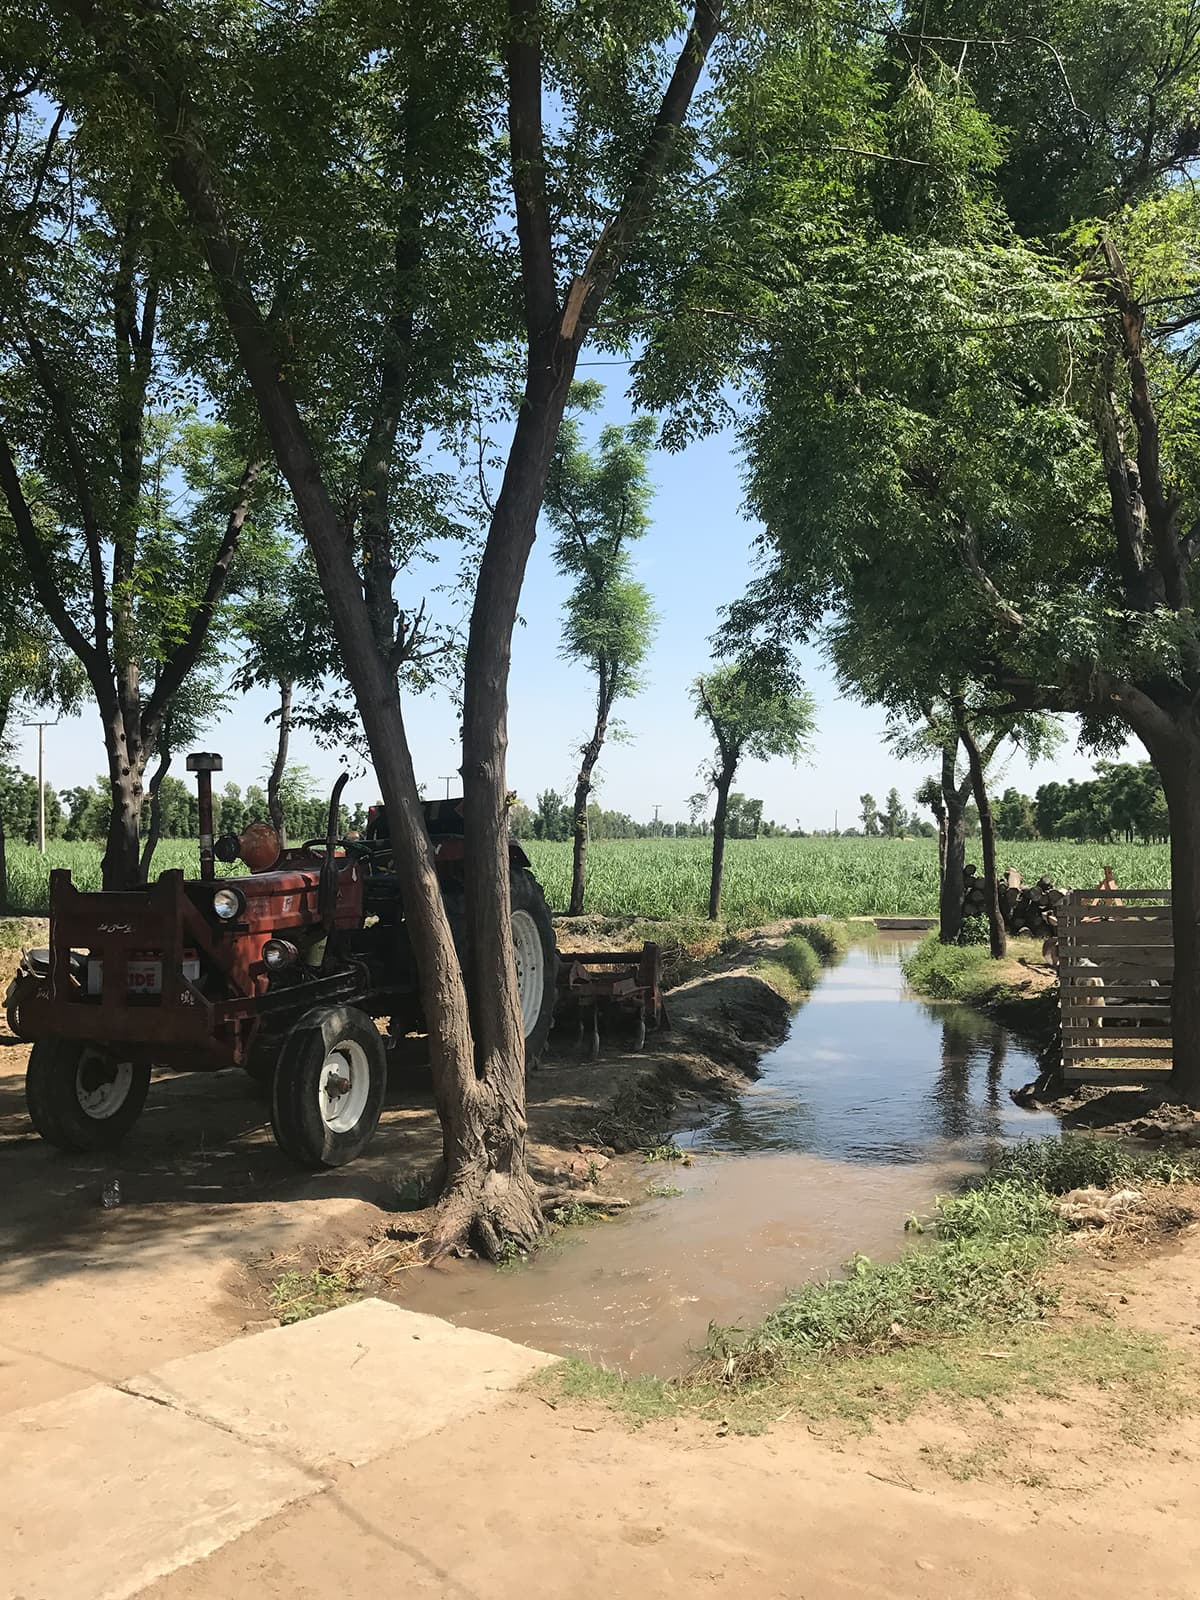 Farmland in Chak Jhumra, Punjab | Ayesha binte Rashid